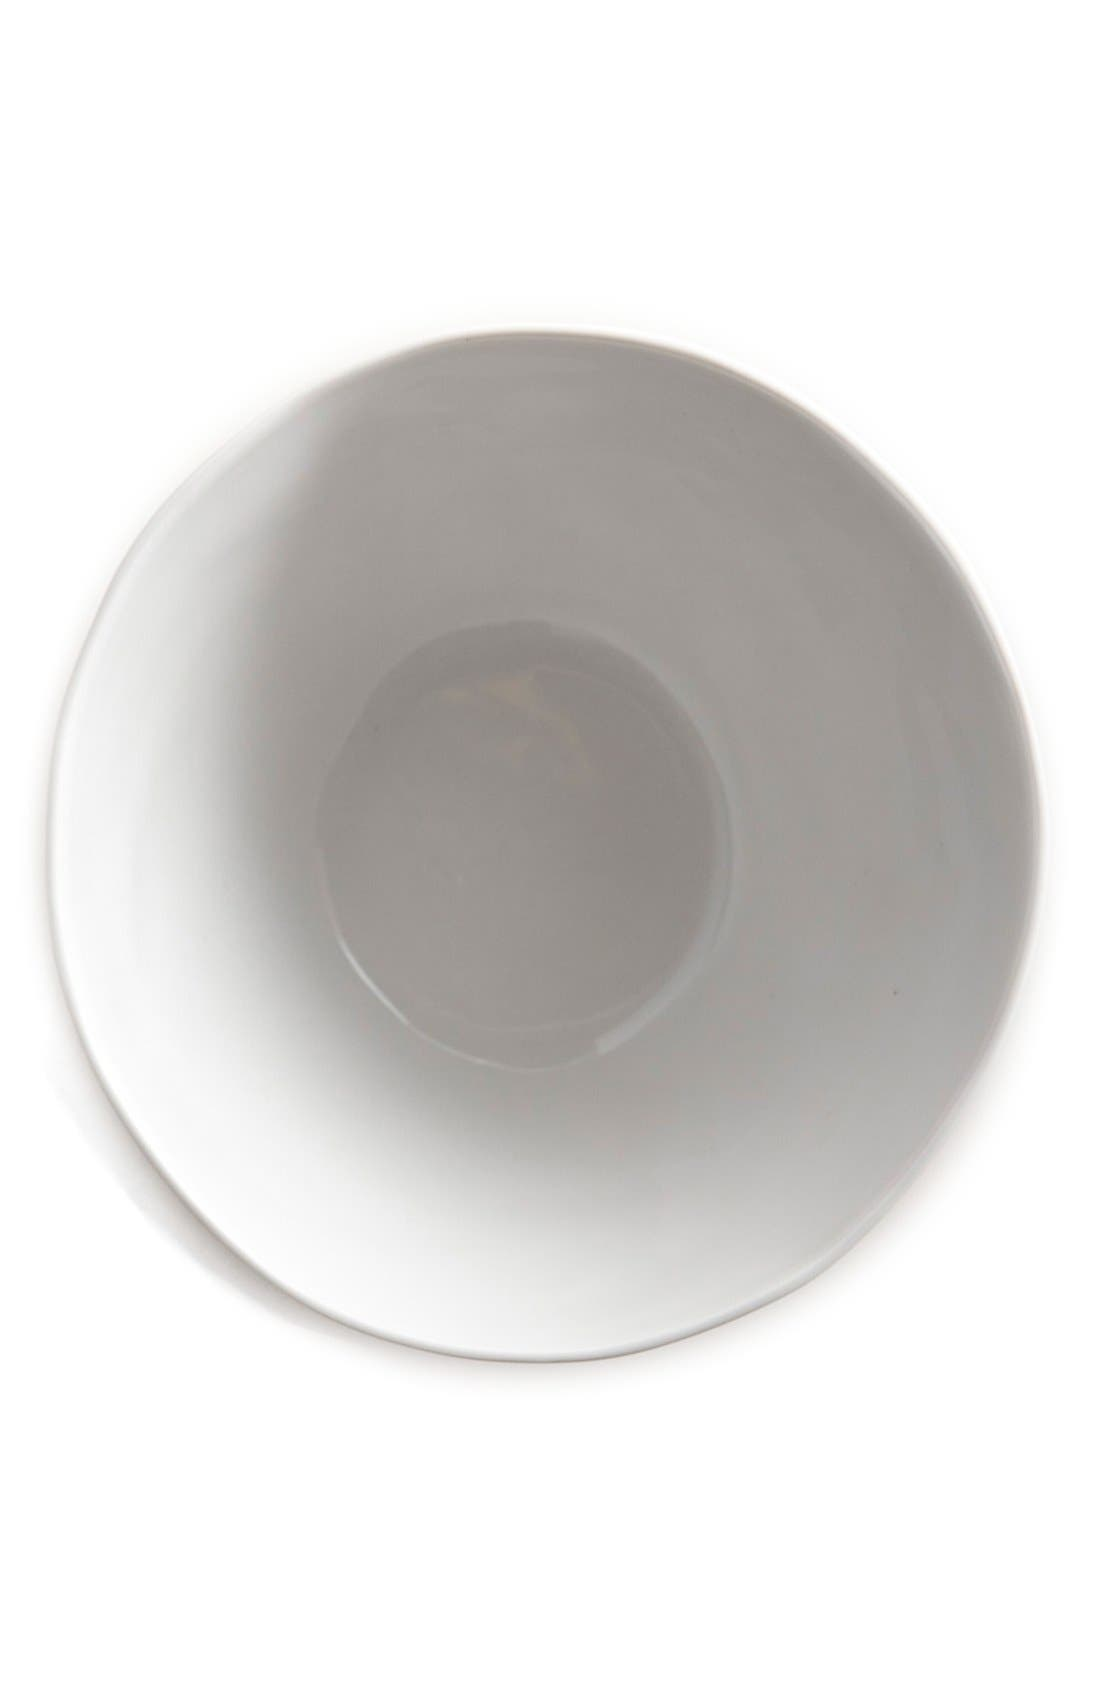 'Sculptured' Cereal Bowls,                             Alternate thumbnail 2, color,                             100